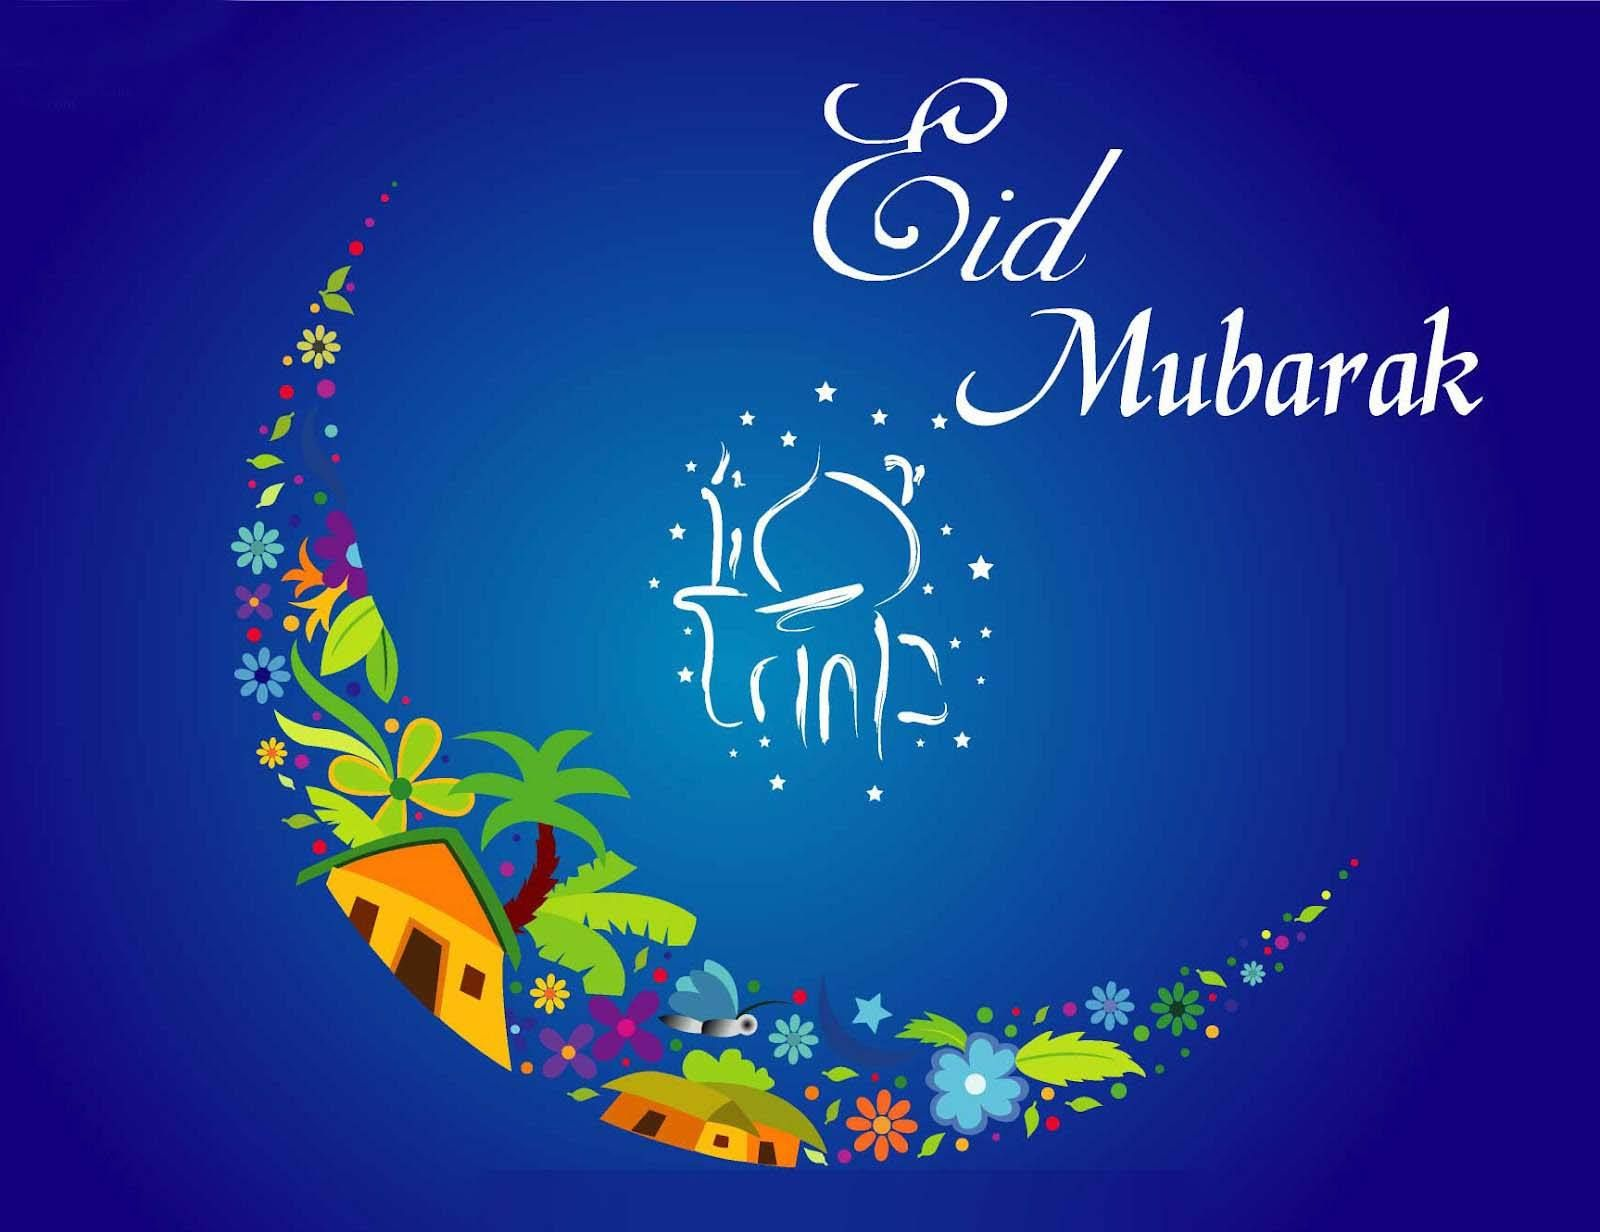 Hd wallpaper ramzan mubarak - Ecards4u Provides Eid Mubarak Eid Wishes Eid Greetings Happy Eid Mubarak Ramzan